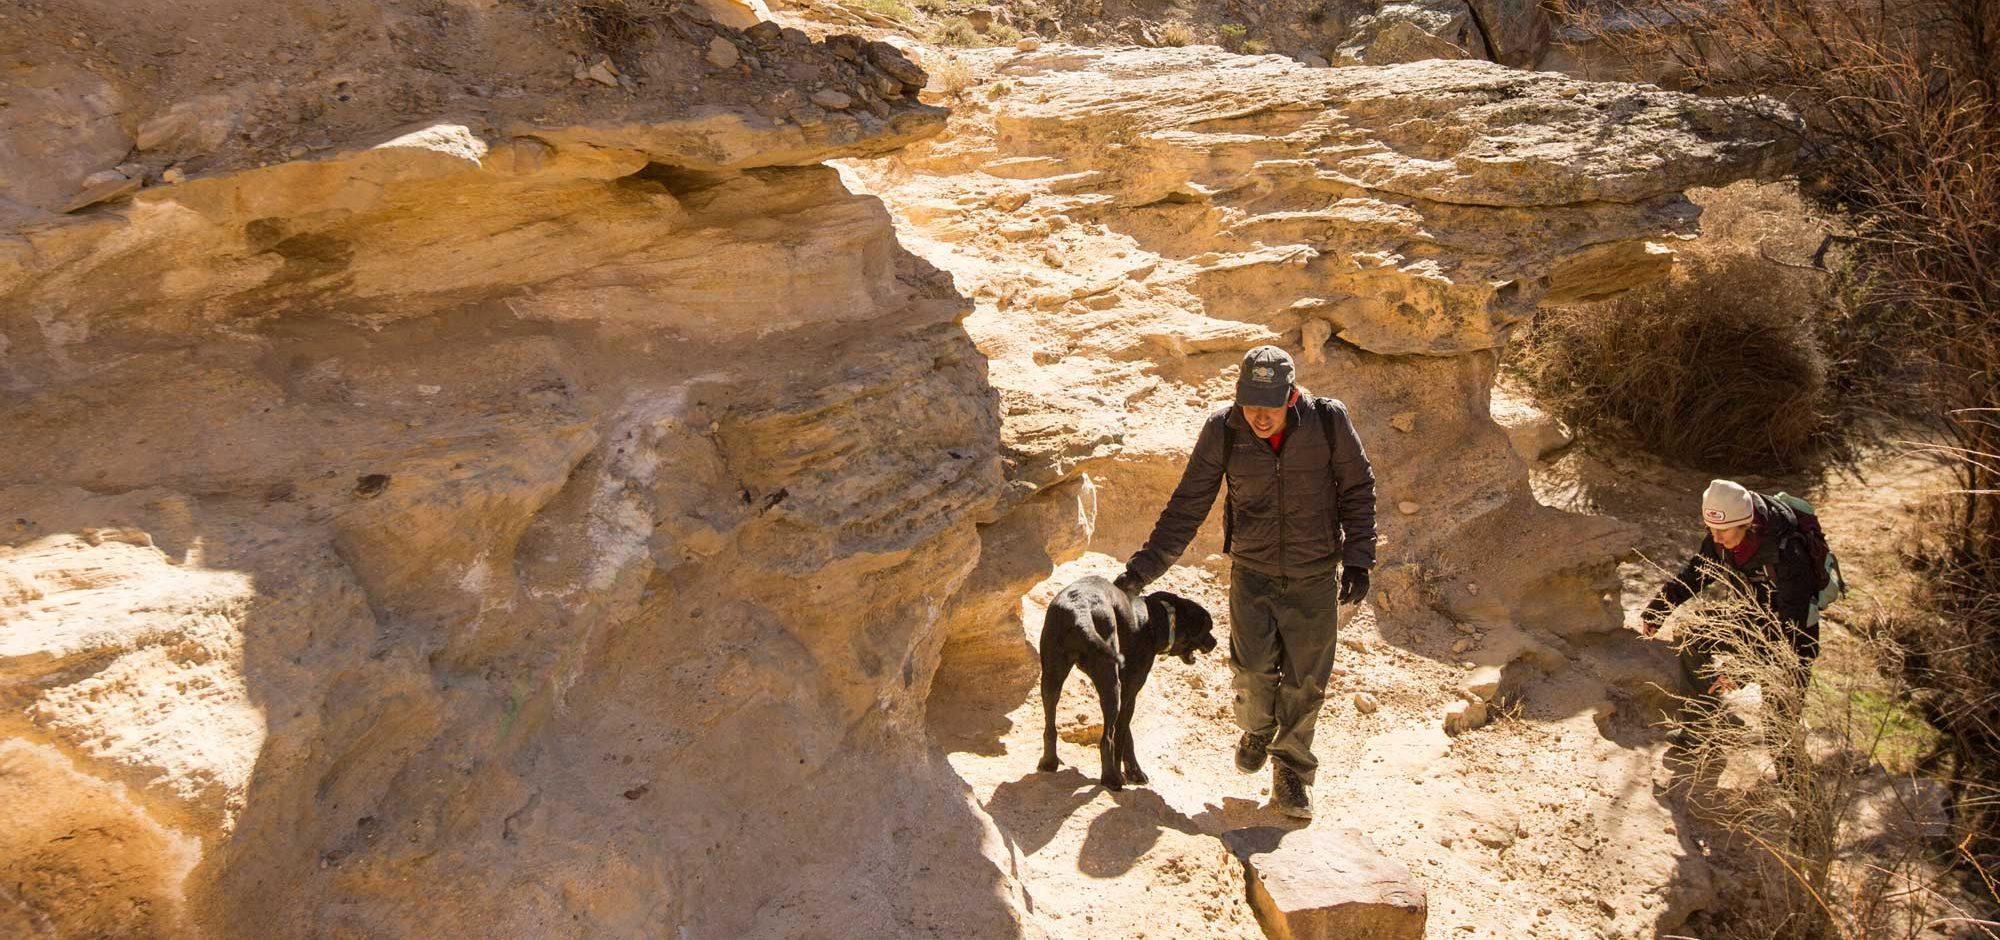 Eagle-Rock-Shelter-1225RBLWeb-3-1-1-2-e1557073217953